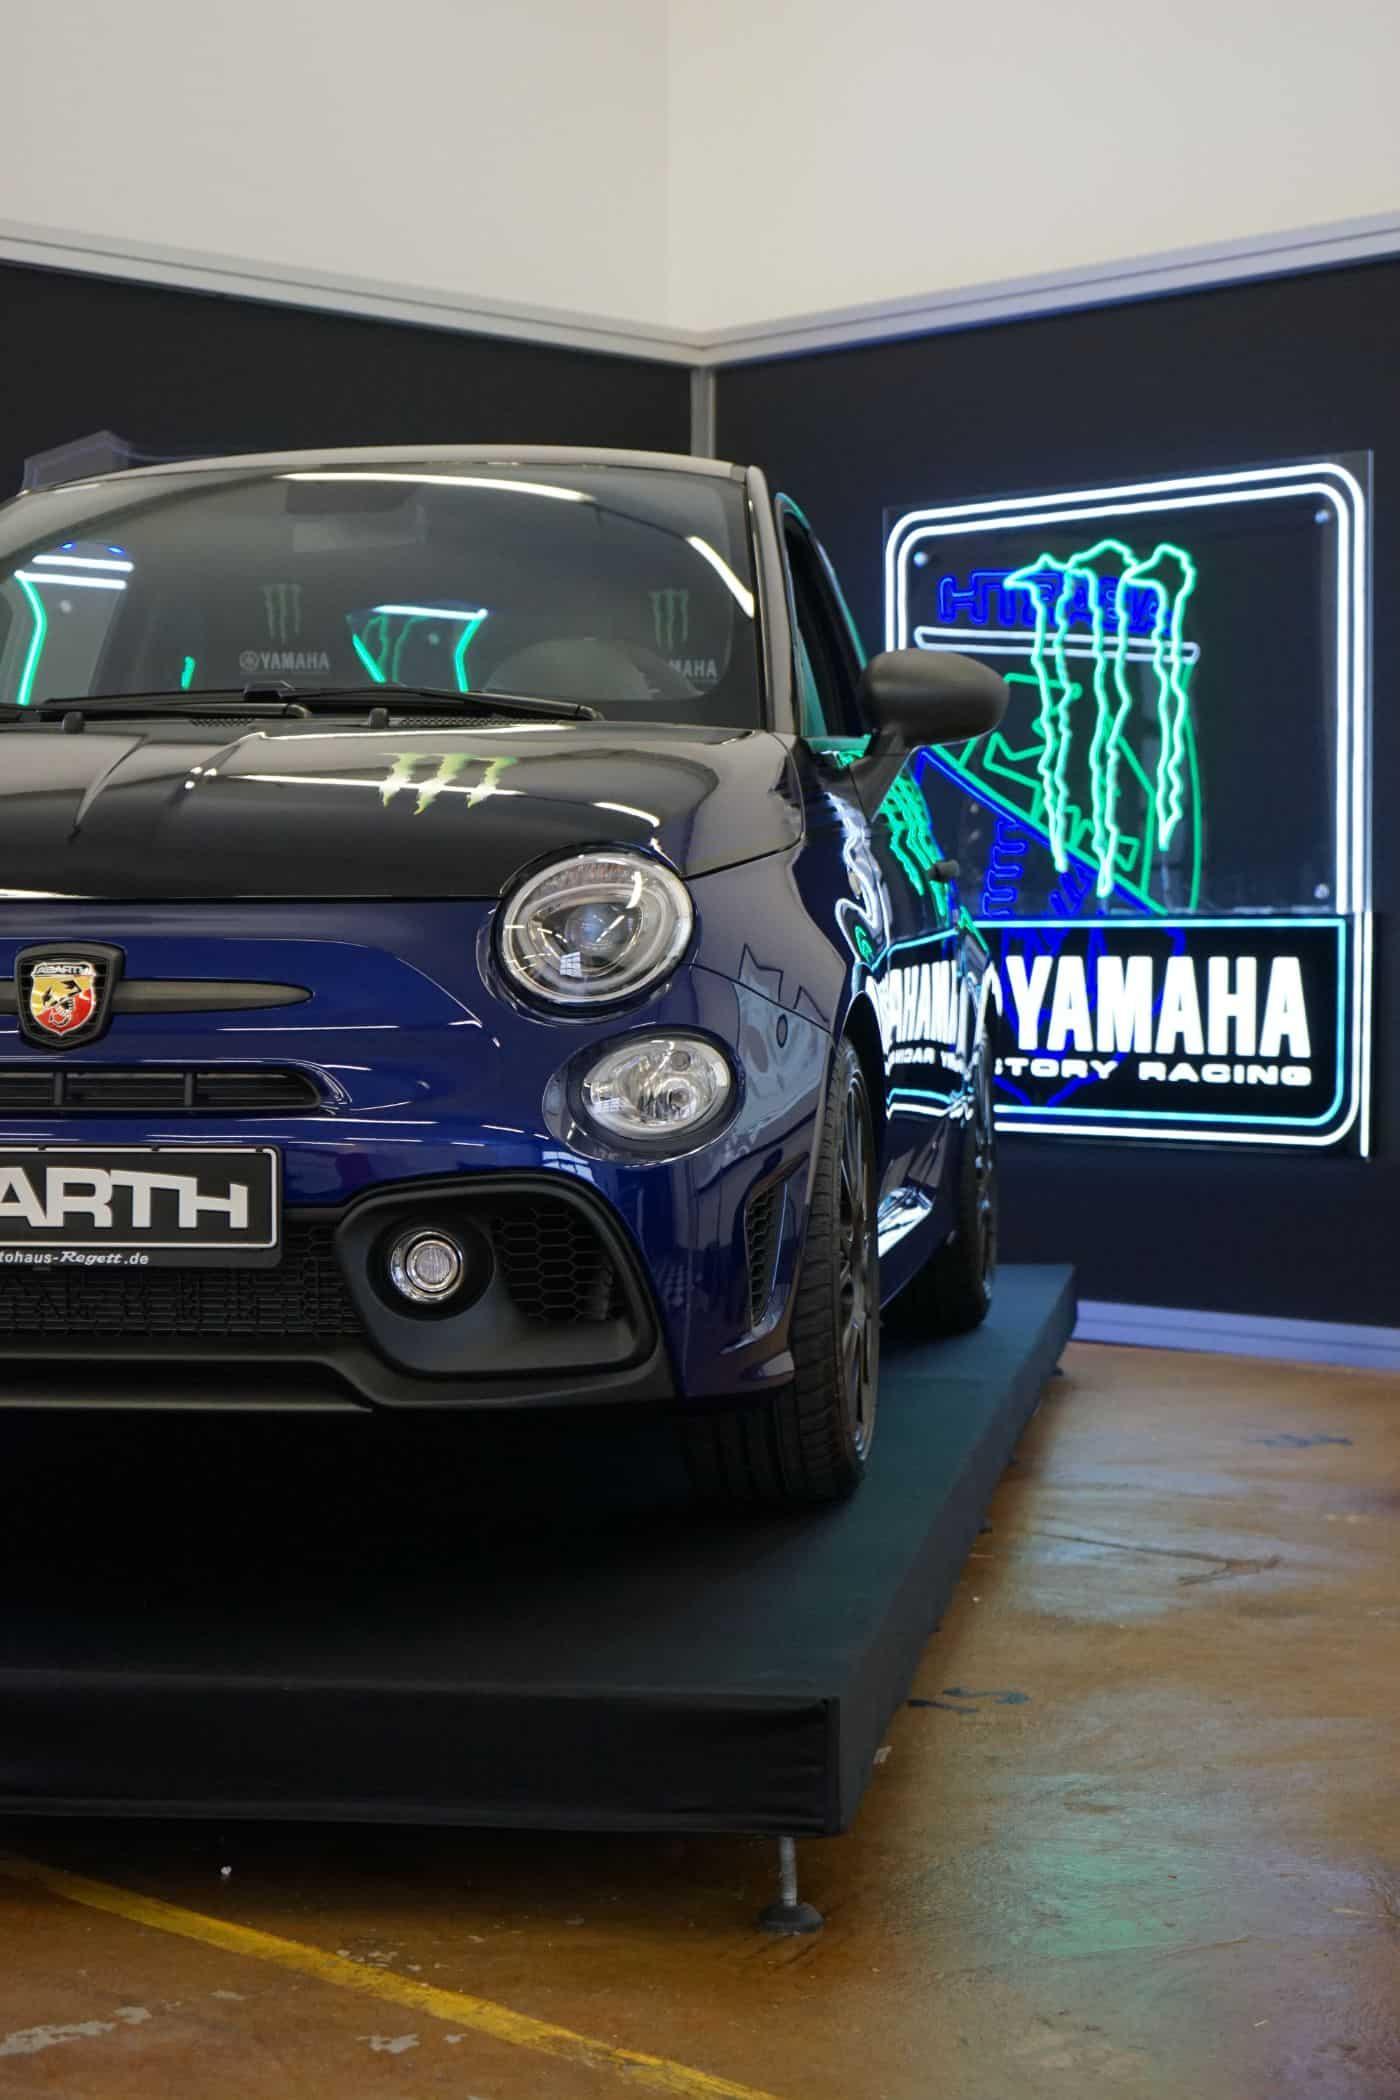 #595 Sondermodelle #Scorpioneoro und #Monster #Energy #Yamaha